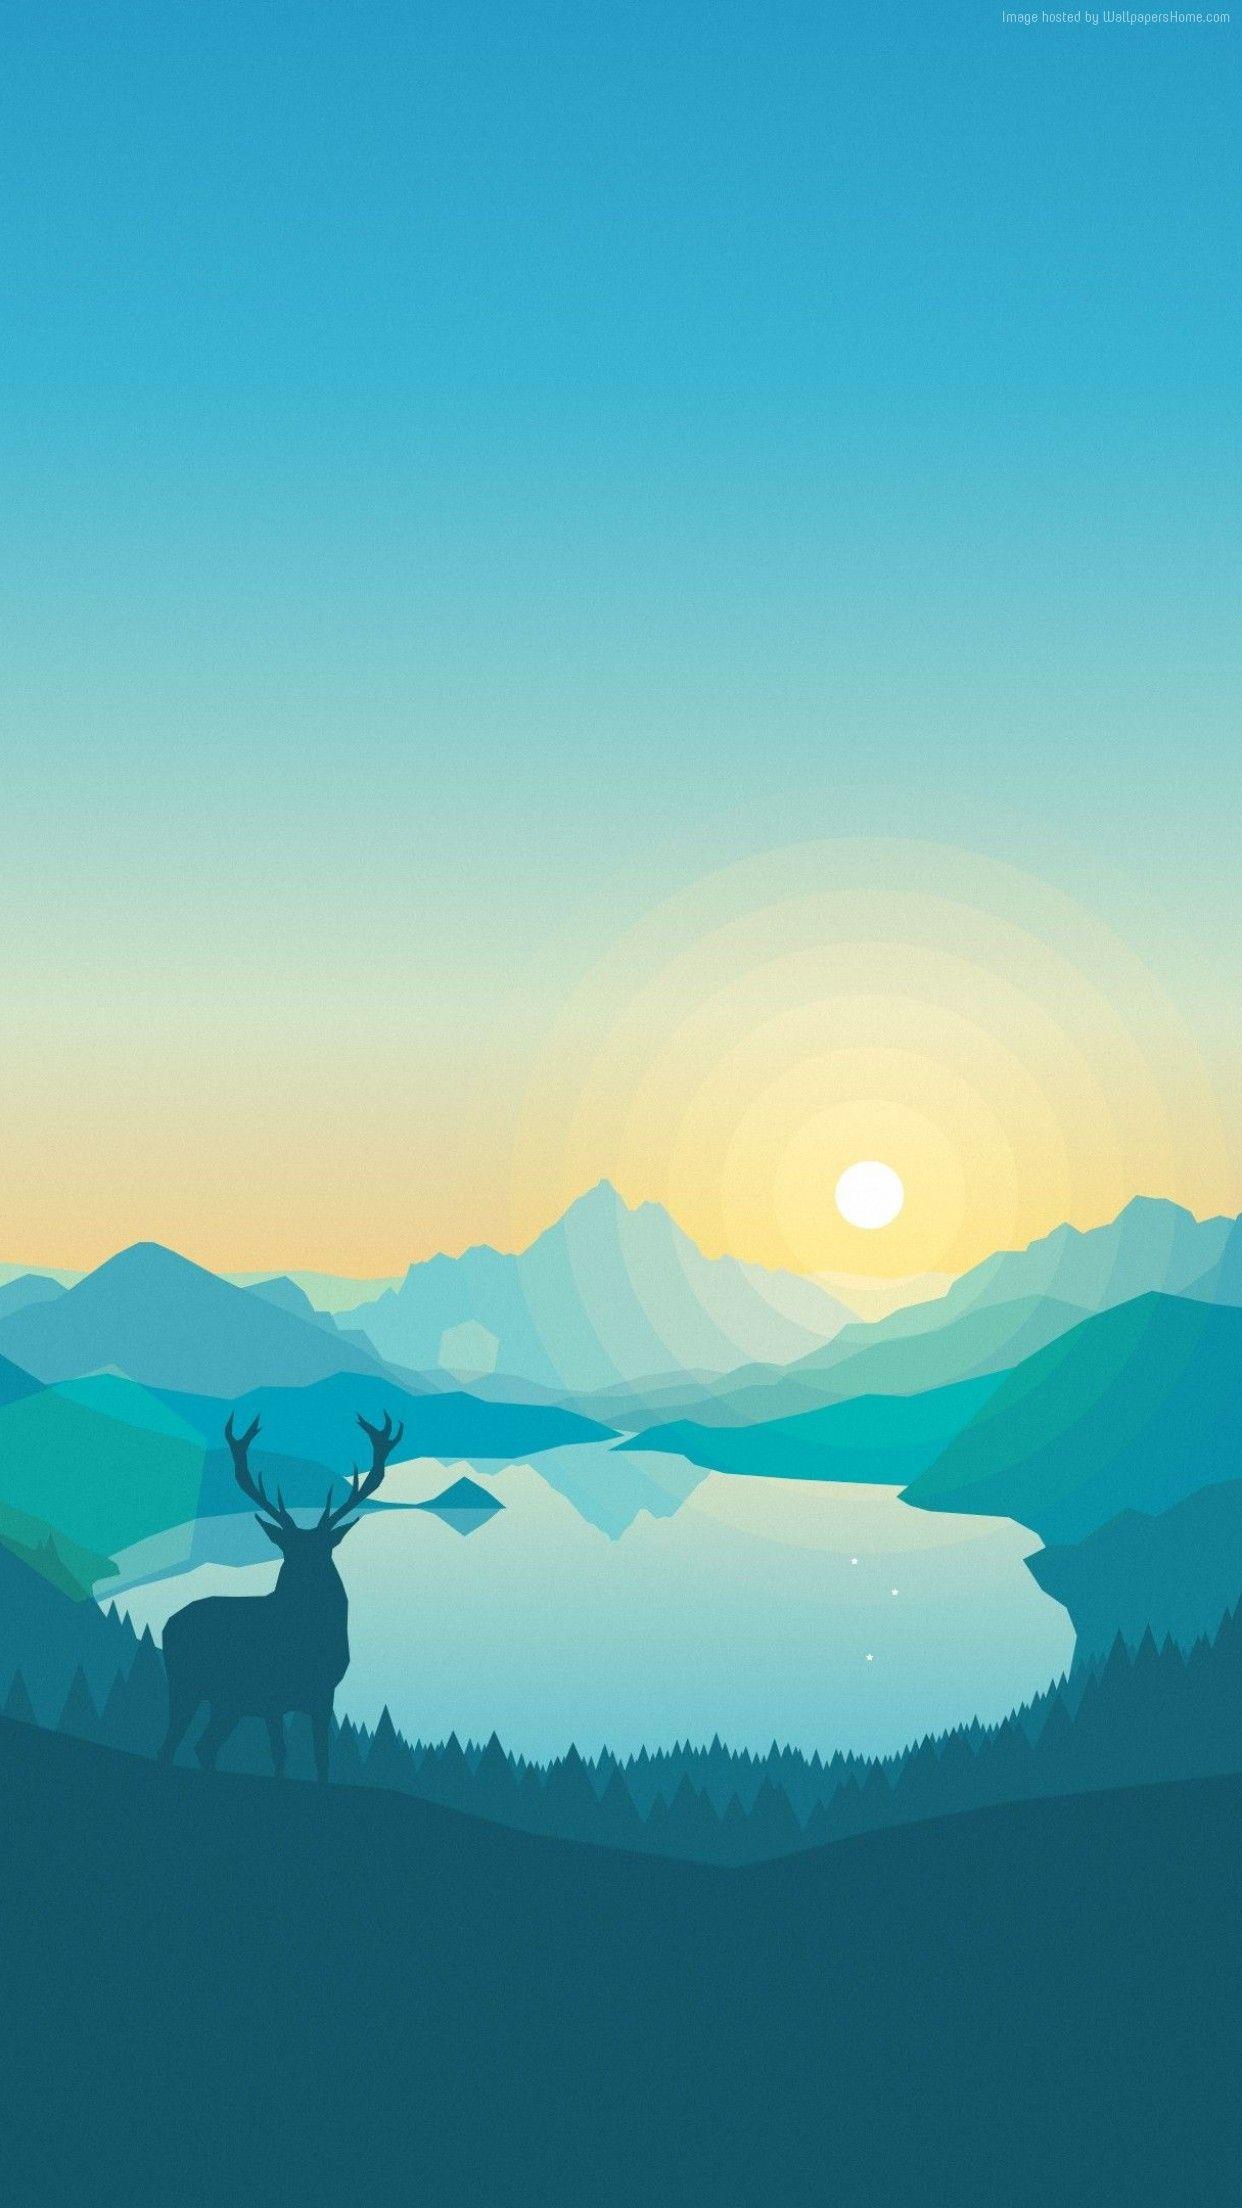 Blue Apple Animation Deer Lake Wallpaper Iphone Clean